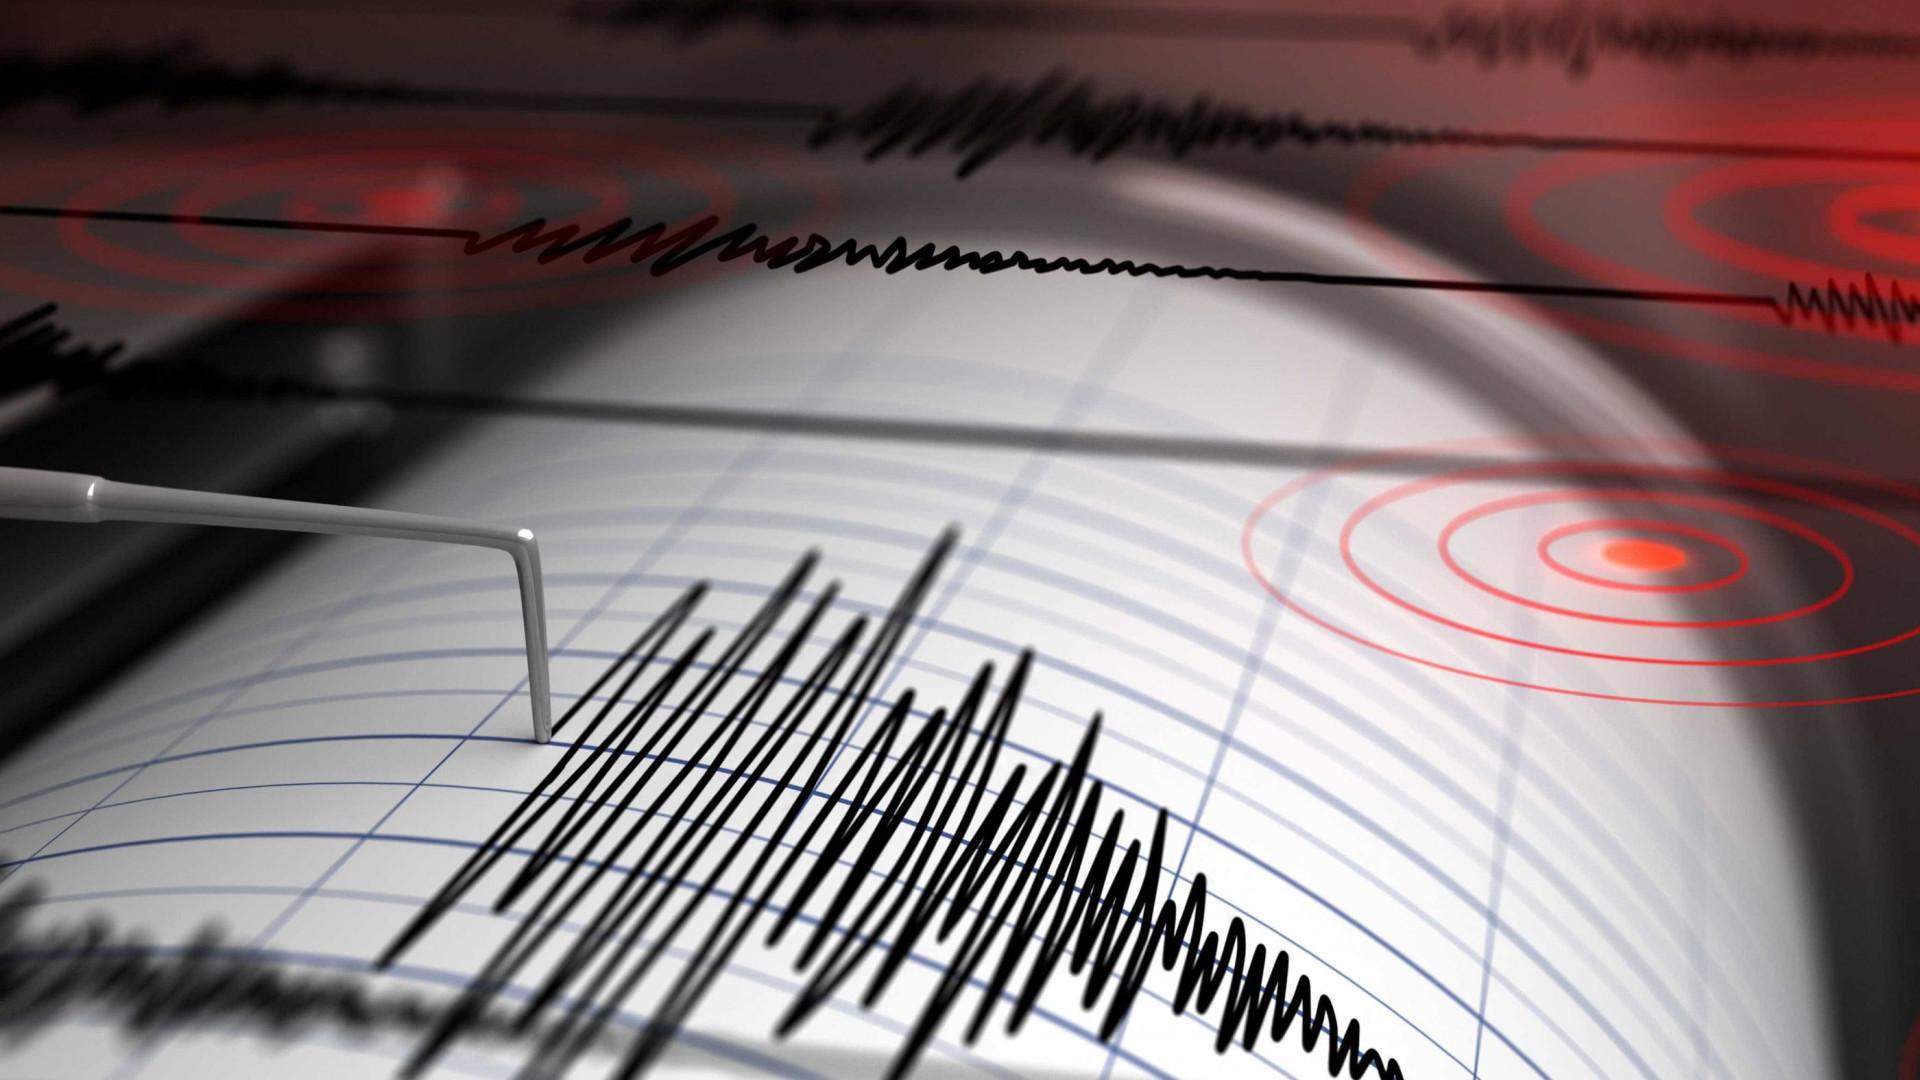 Dois sismos de 6,2 e 5,4 sentidos no centro da Colômbia